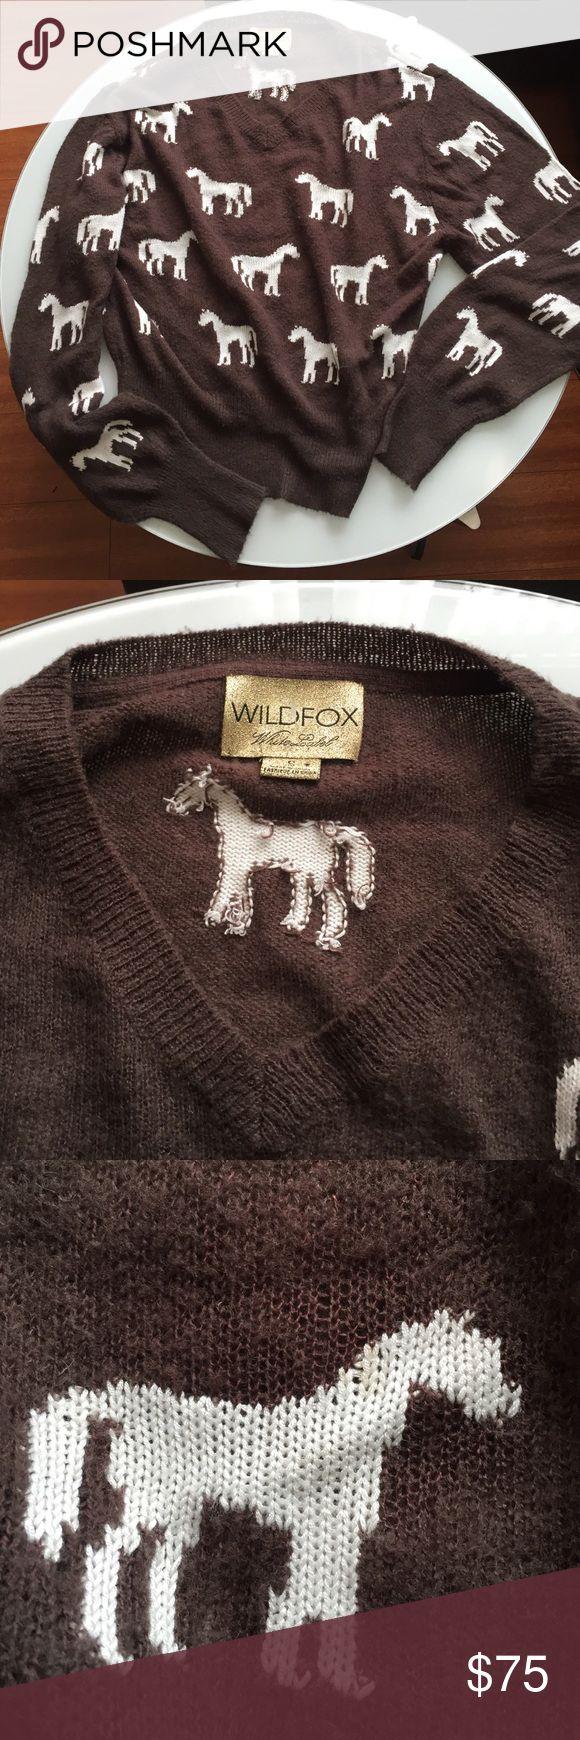 Wildfox white label horses sweater Size small like new Wildfox Sweaters V-Necks